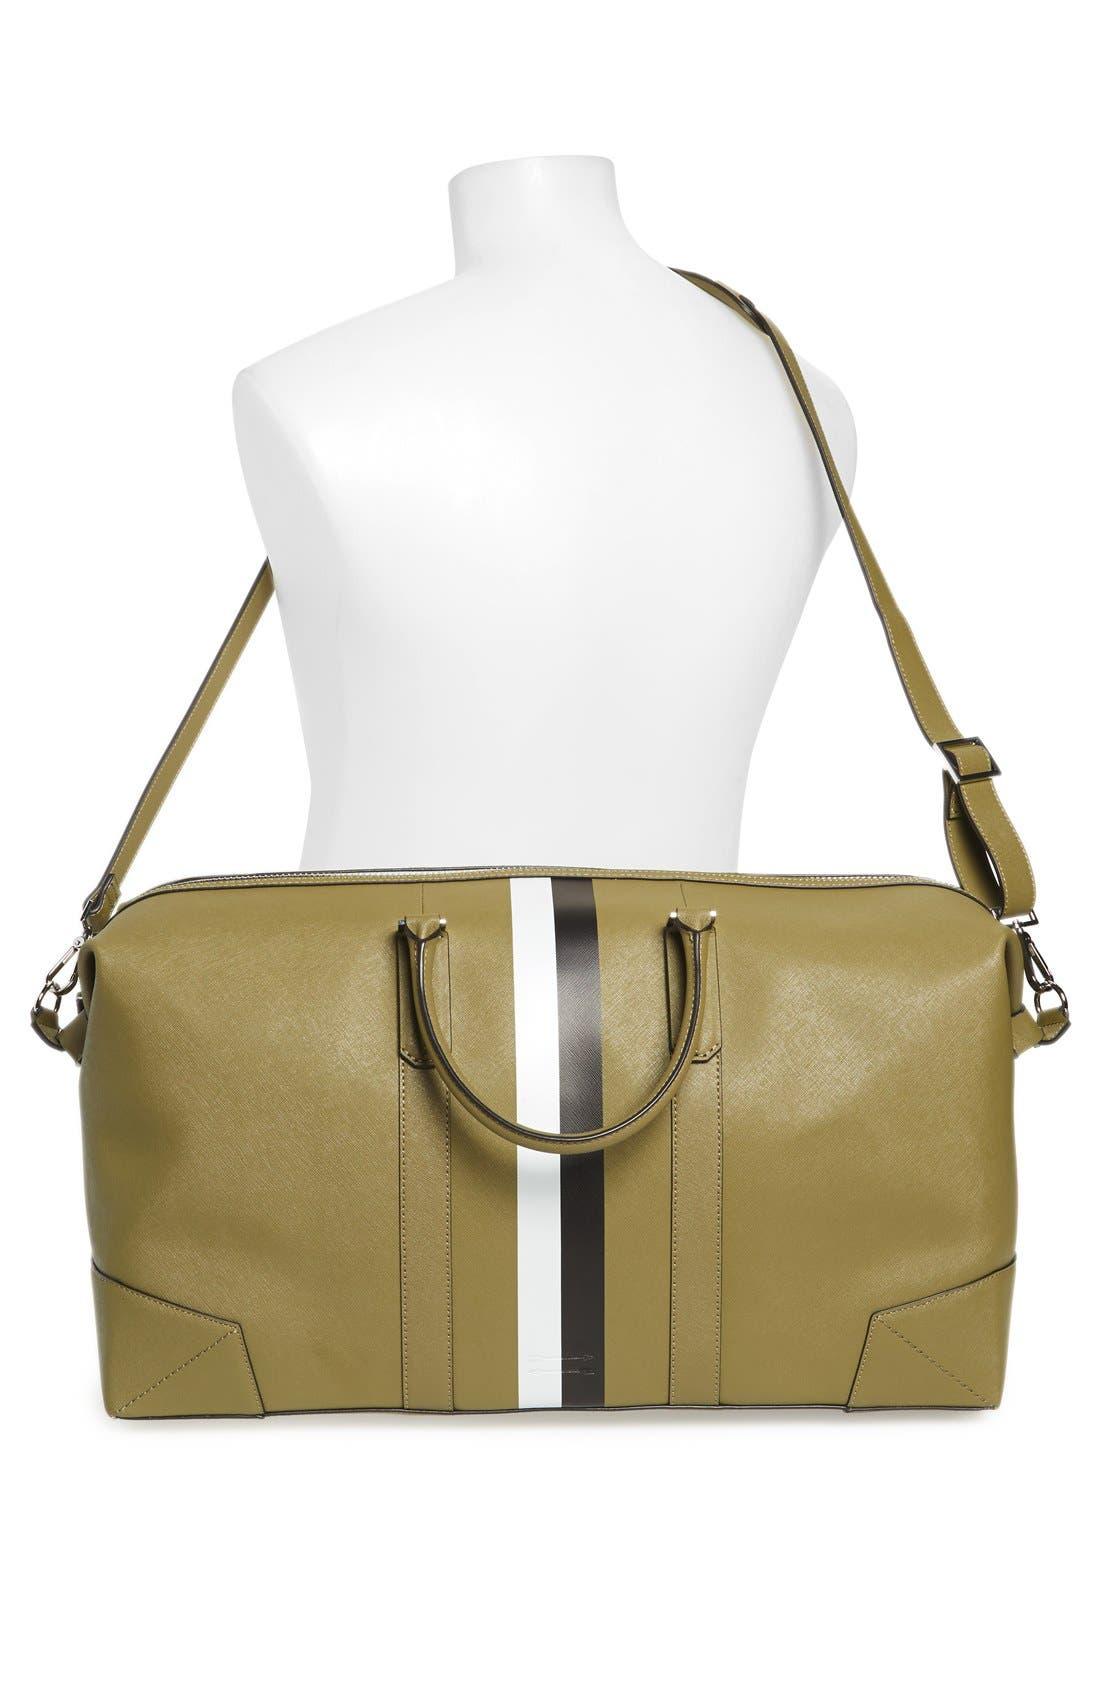 Alternate Image 2  - Ben Minkoff 'Wythe' Weekend Size Saffiano Leather Duffel Bag